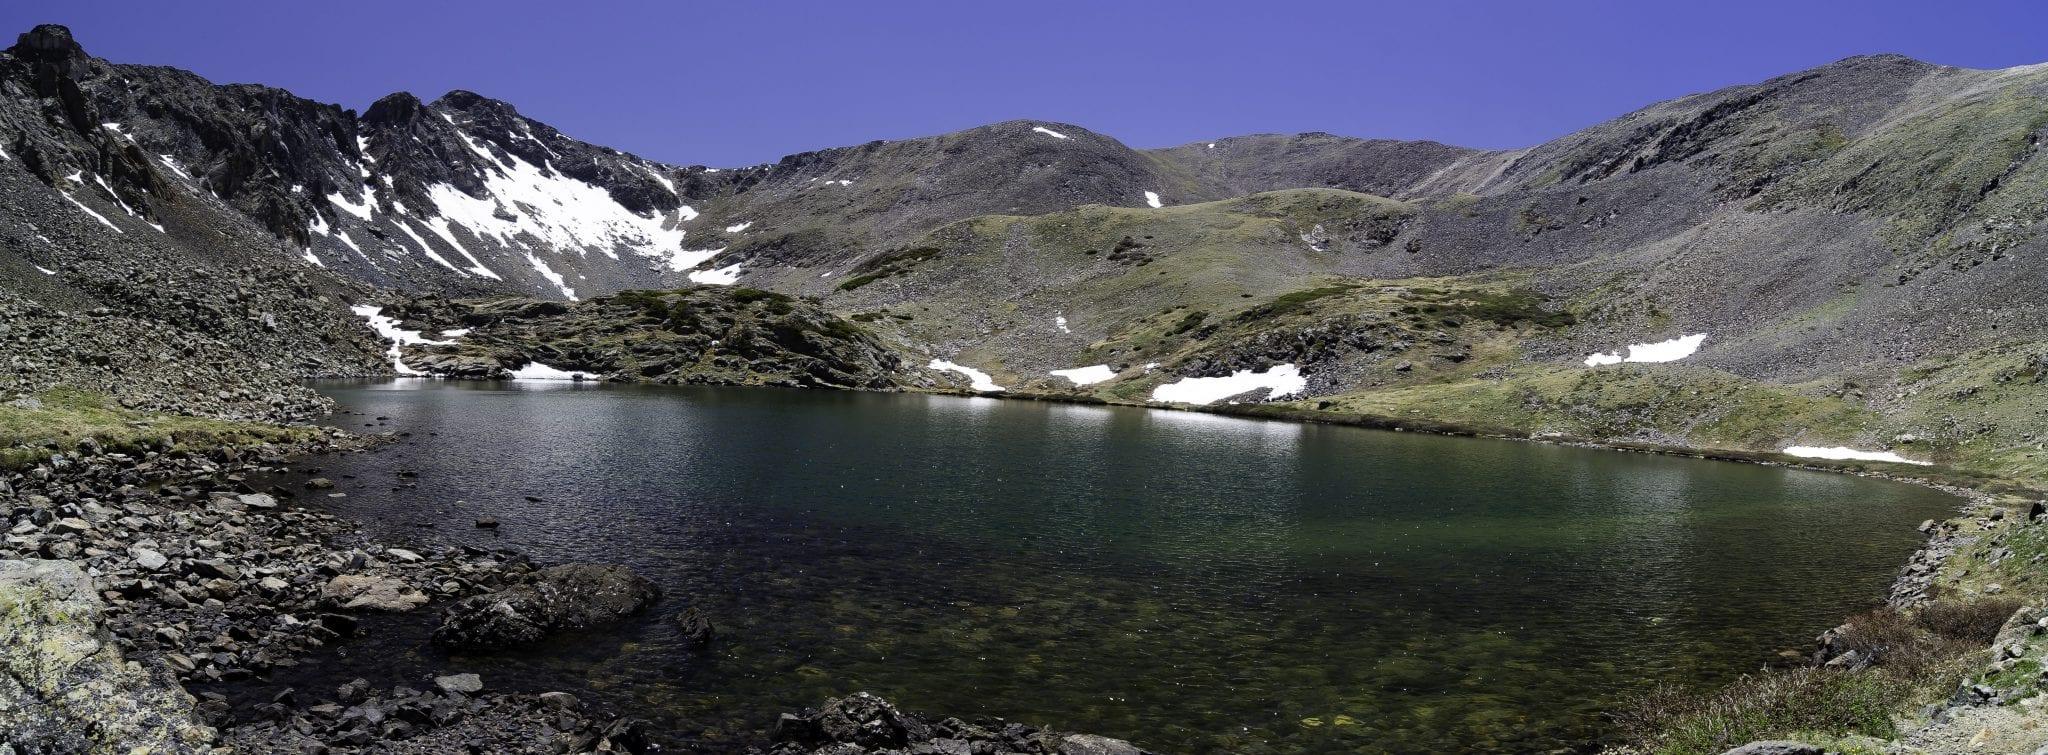 Stout Lake in the Sangre de Cristo Wilderness